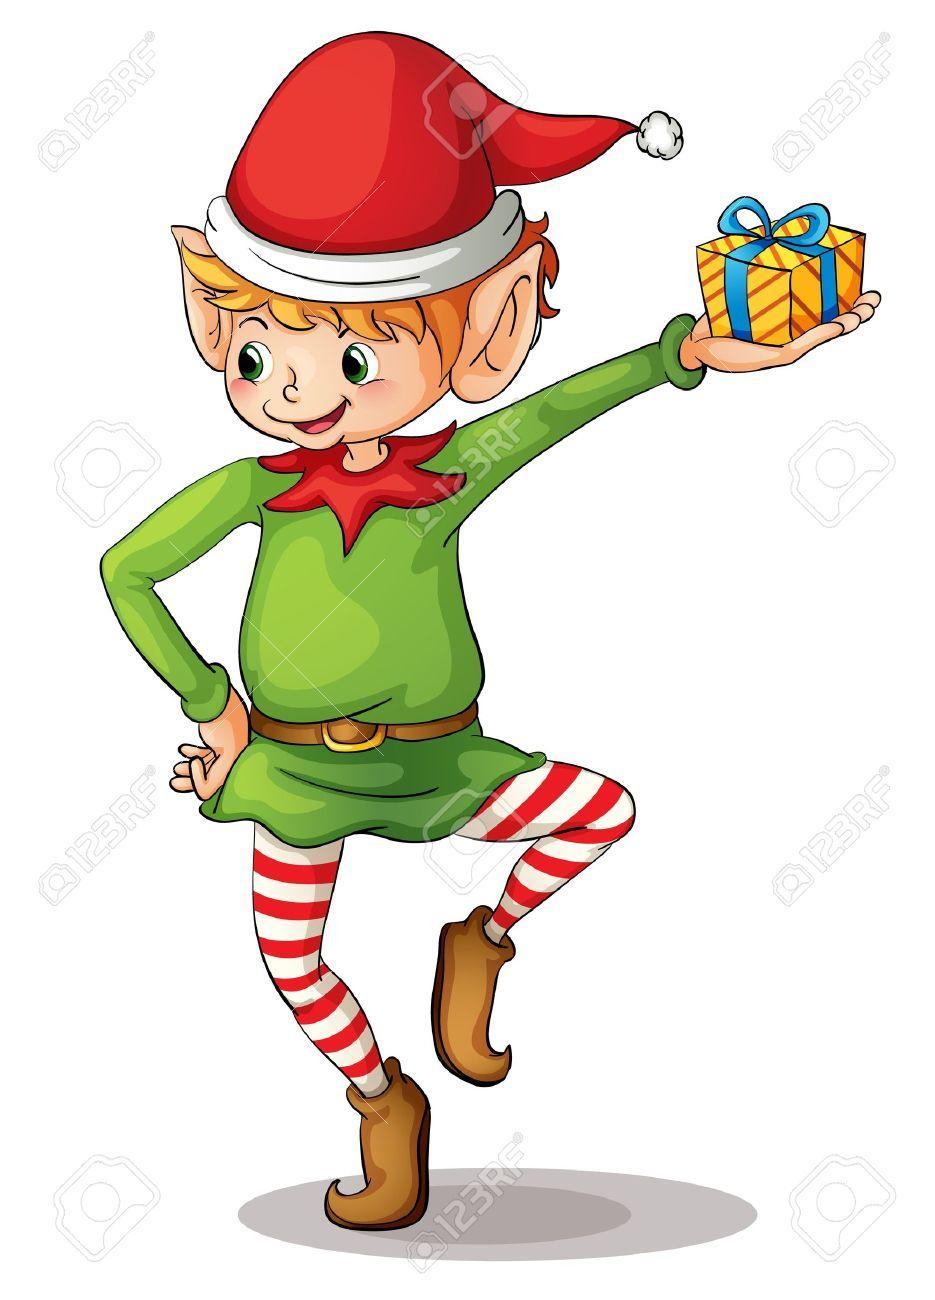 illustration of a christmas elf pinterest elves santas workshop rh pinterest com free elf clipart black and white free clipart elf hat